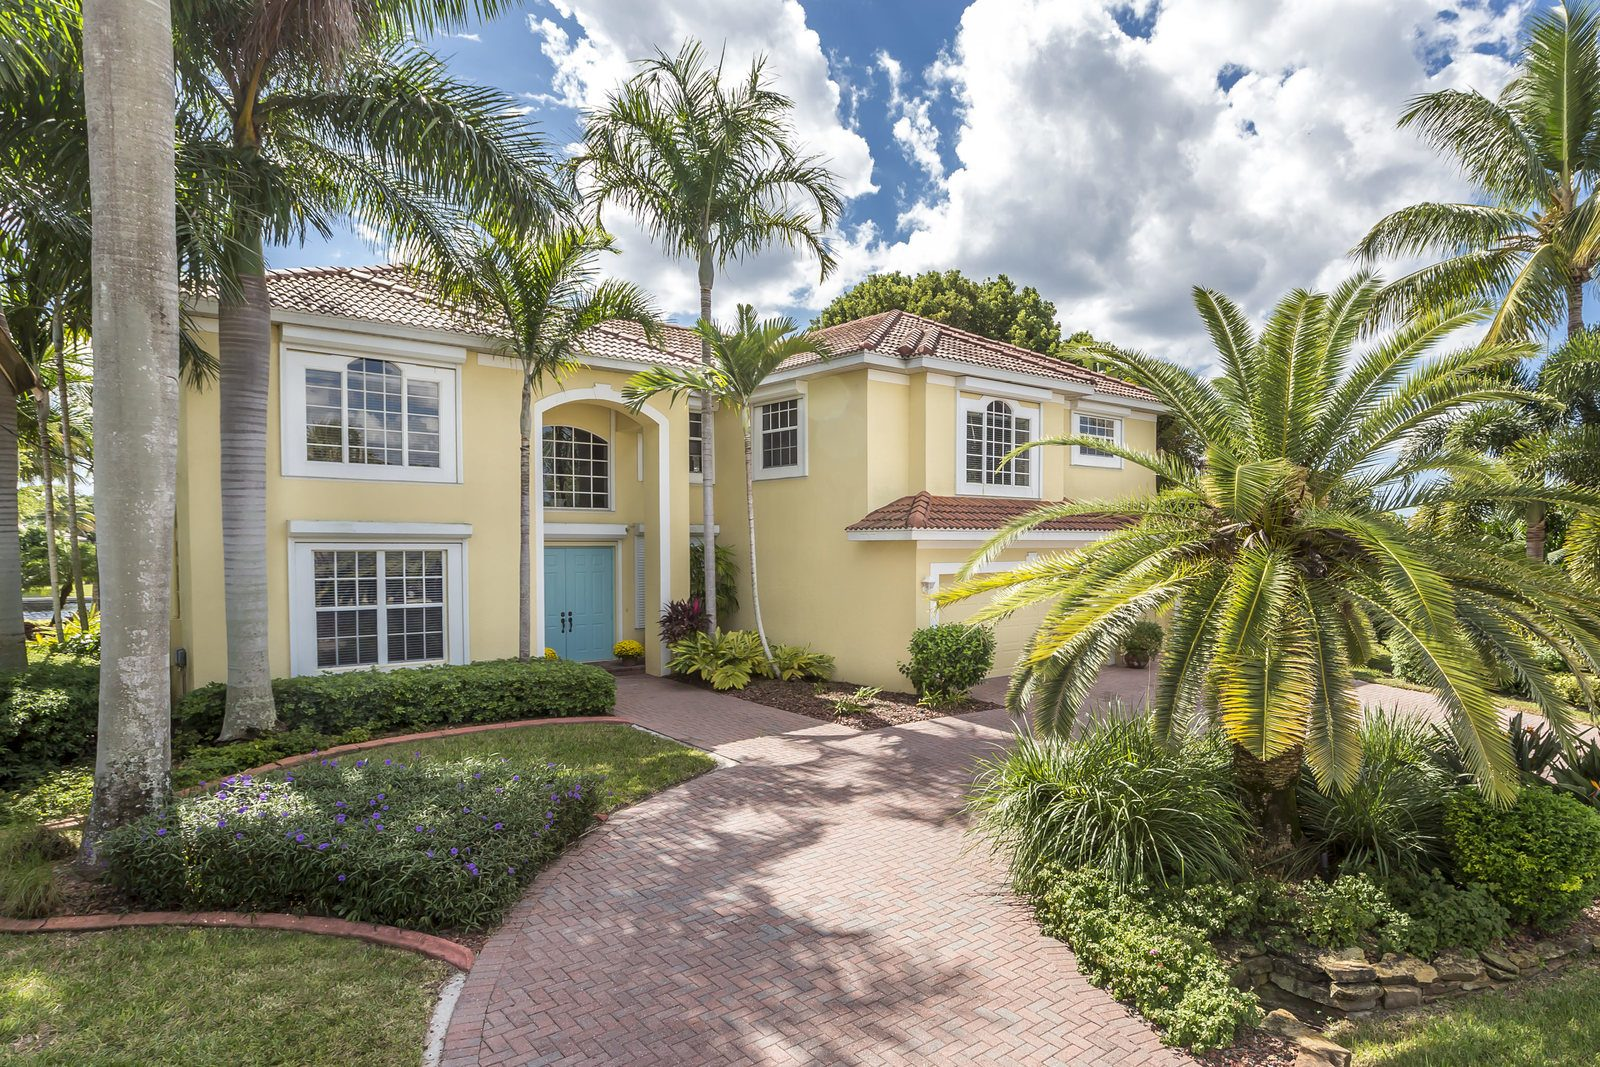 Villa Vendome Vacation Rental Cape Coral Florida Villa